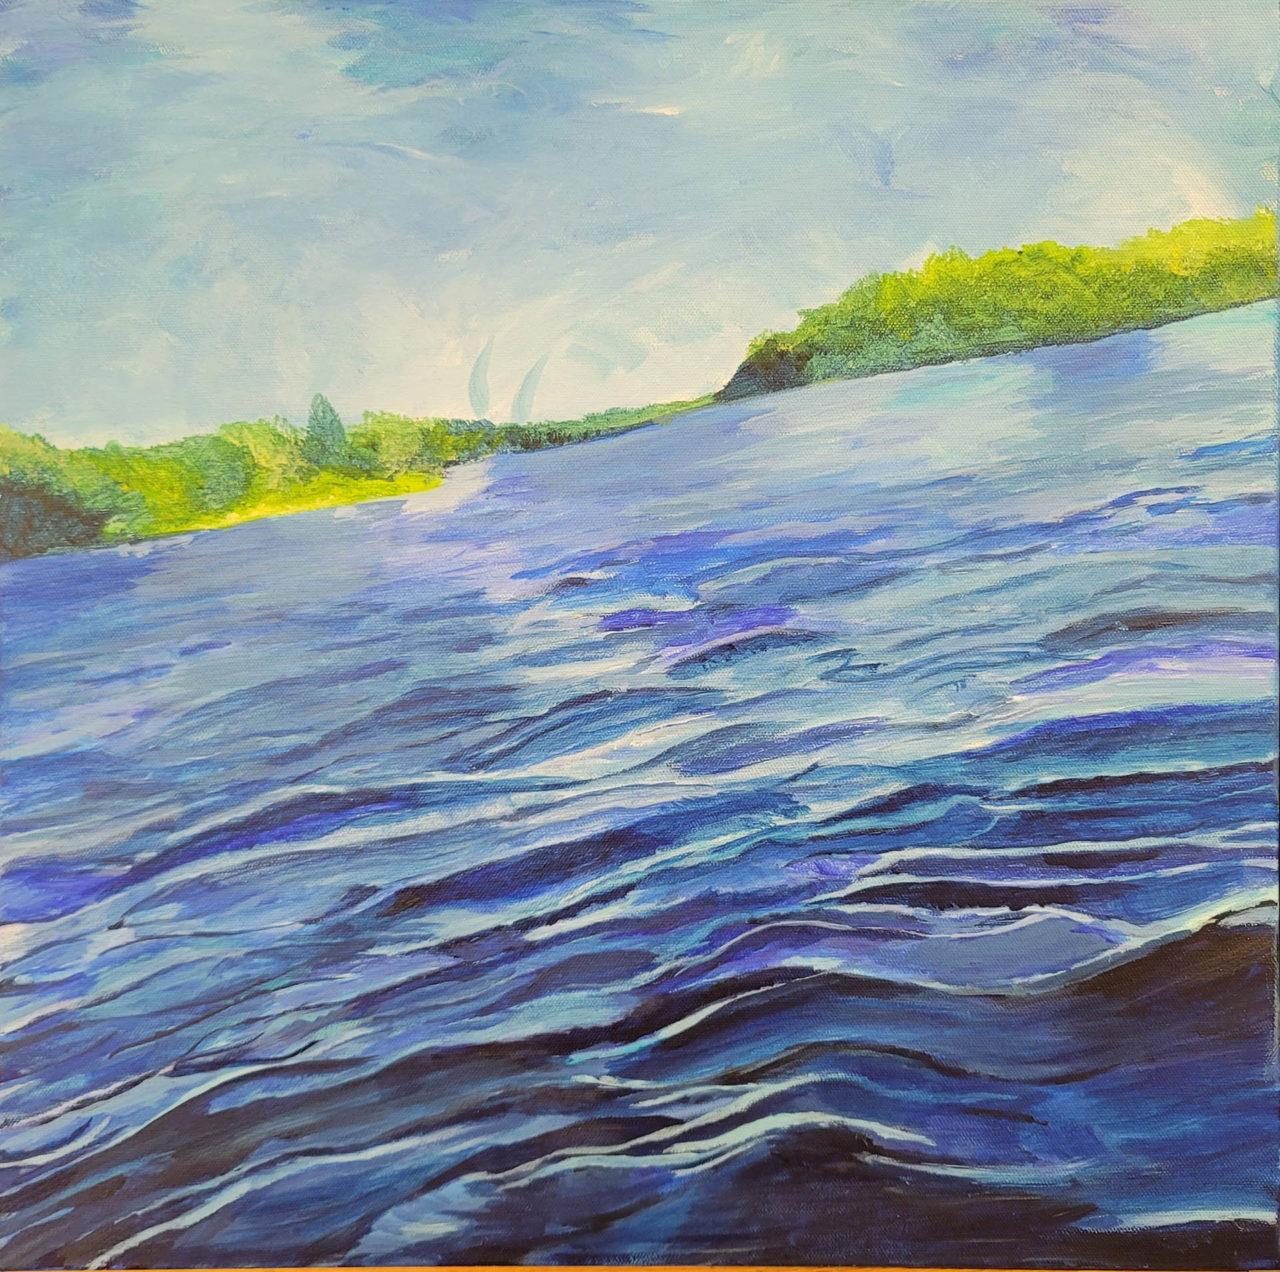 Kayaking - Nancy Marlin Snyder